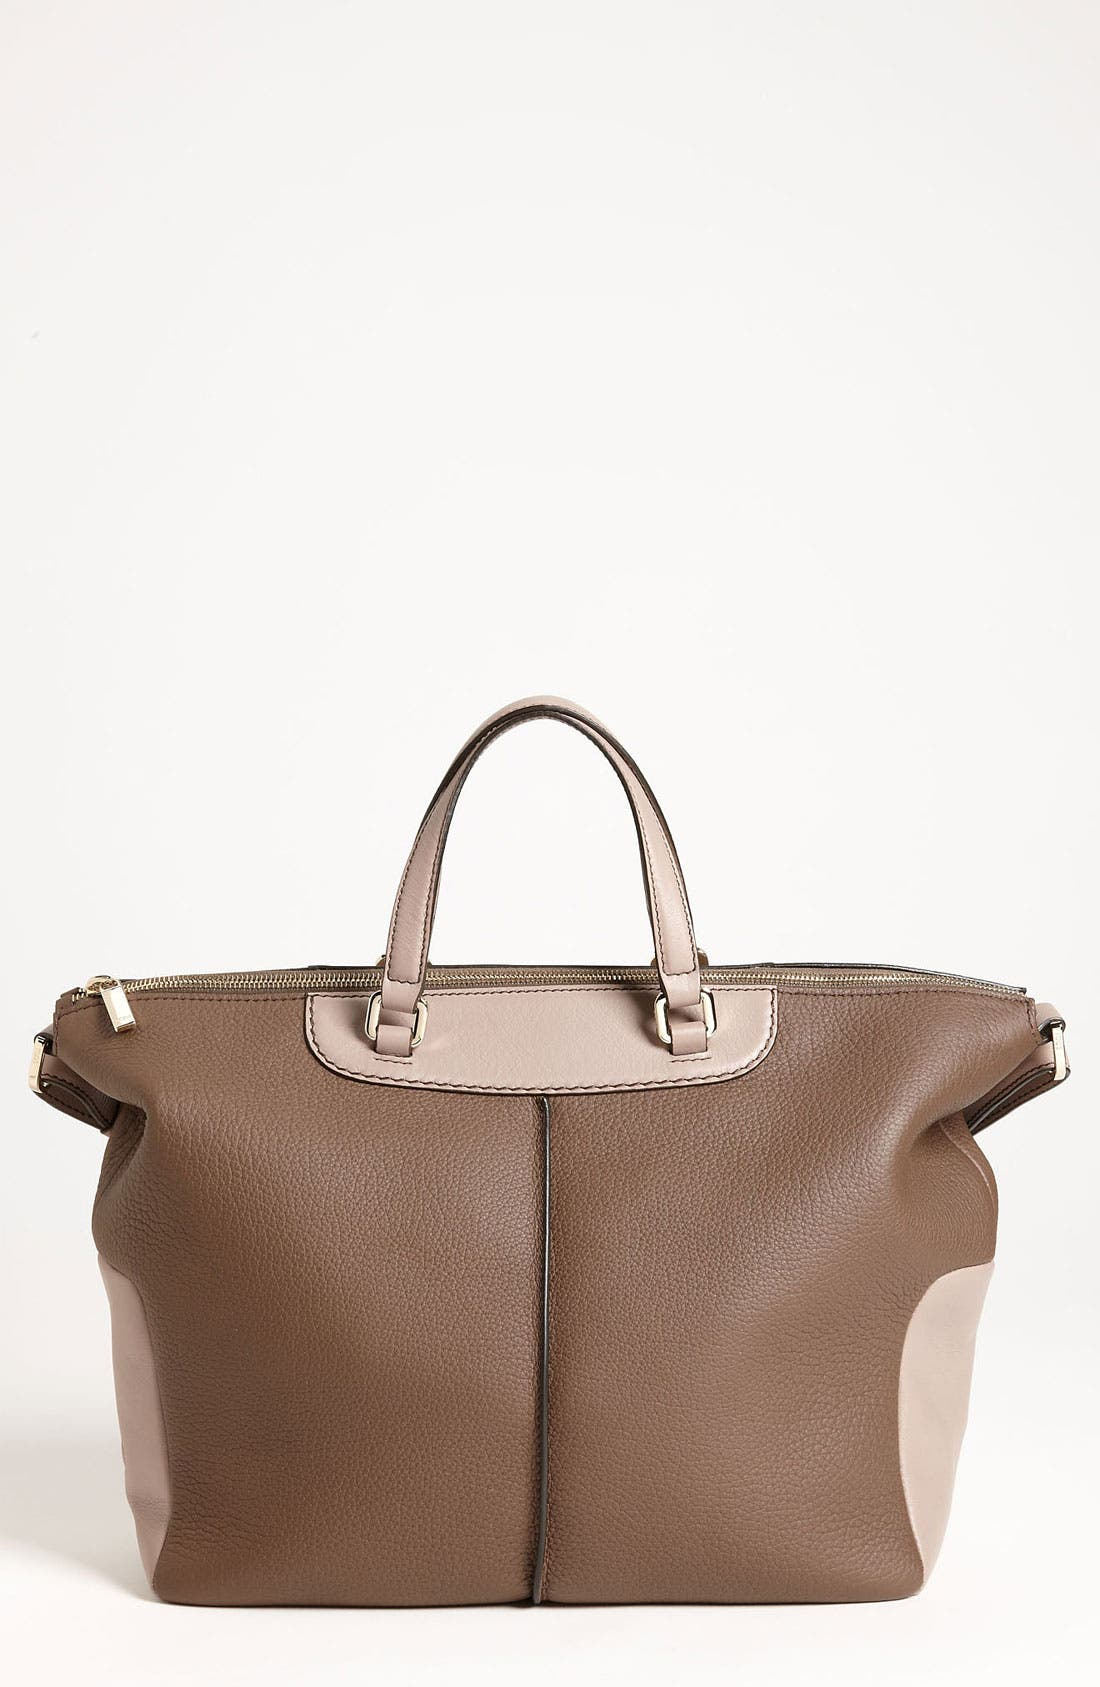 Main Image - Tod's 'Classic - Medium' Leather Tote